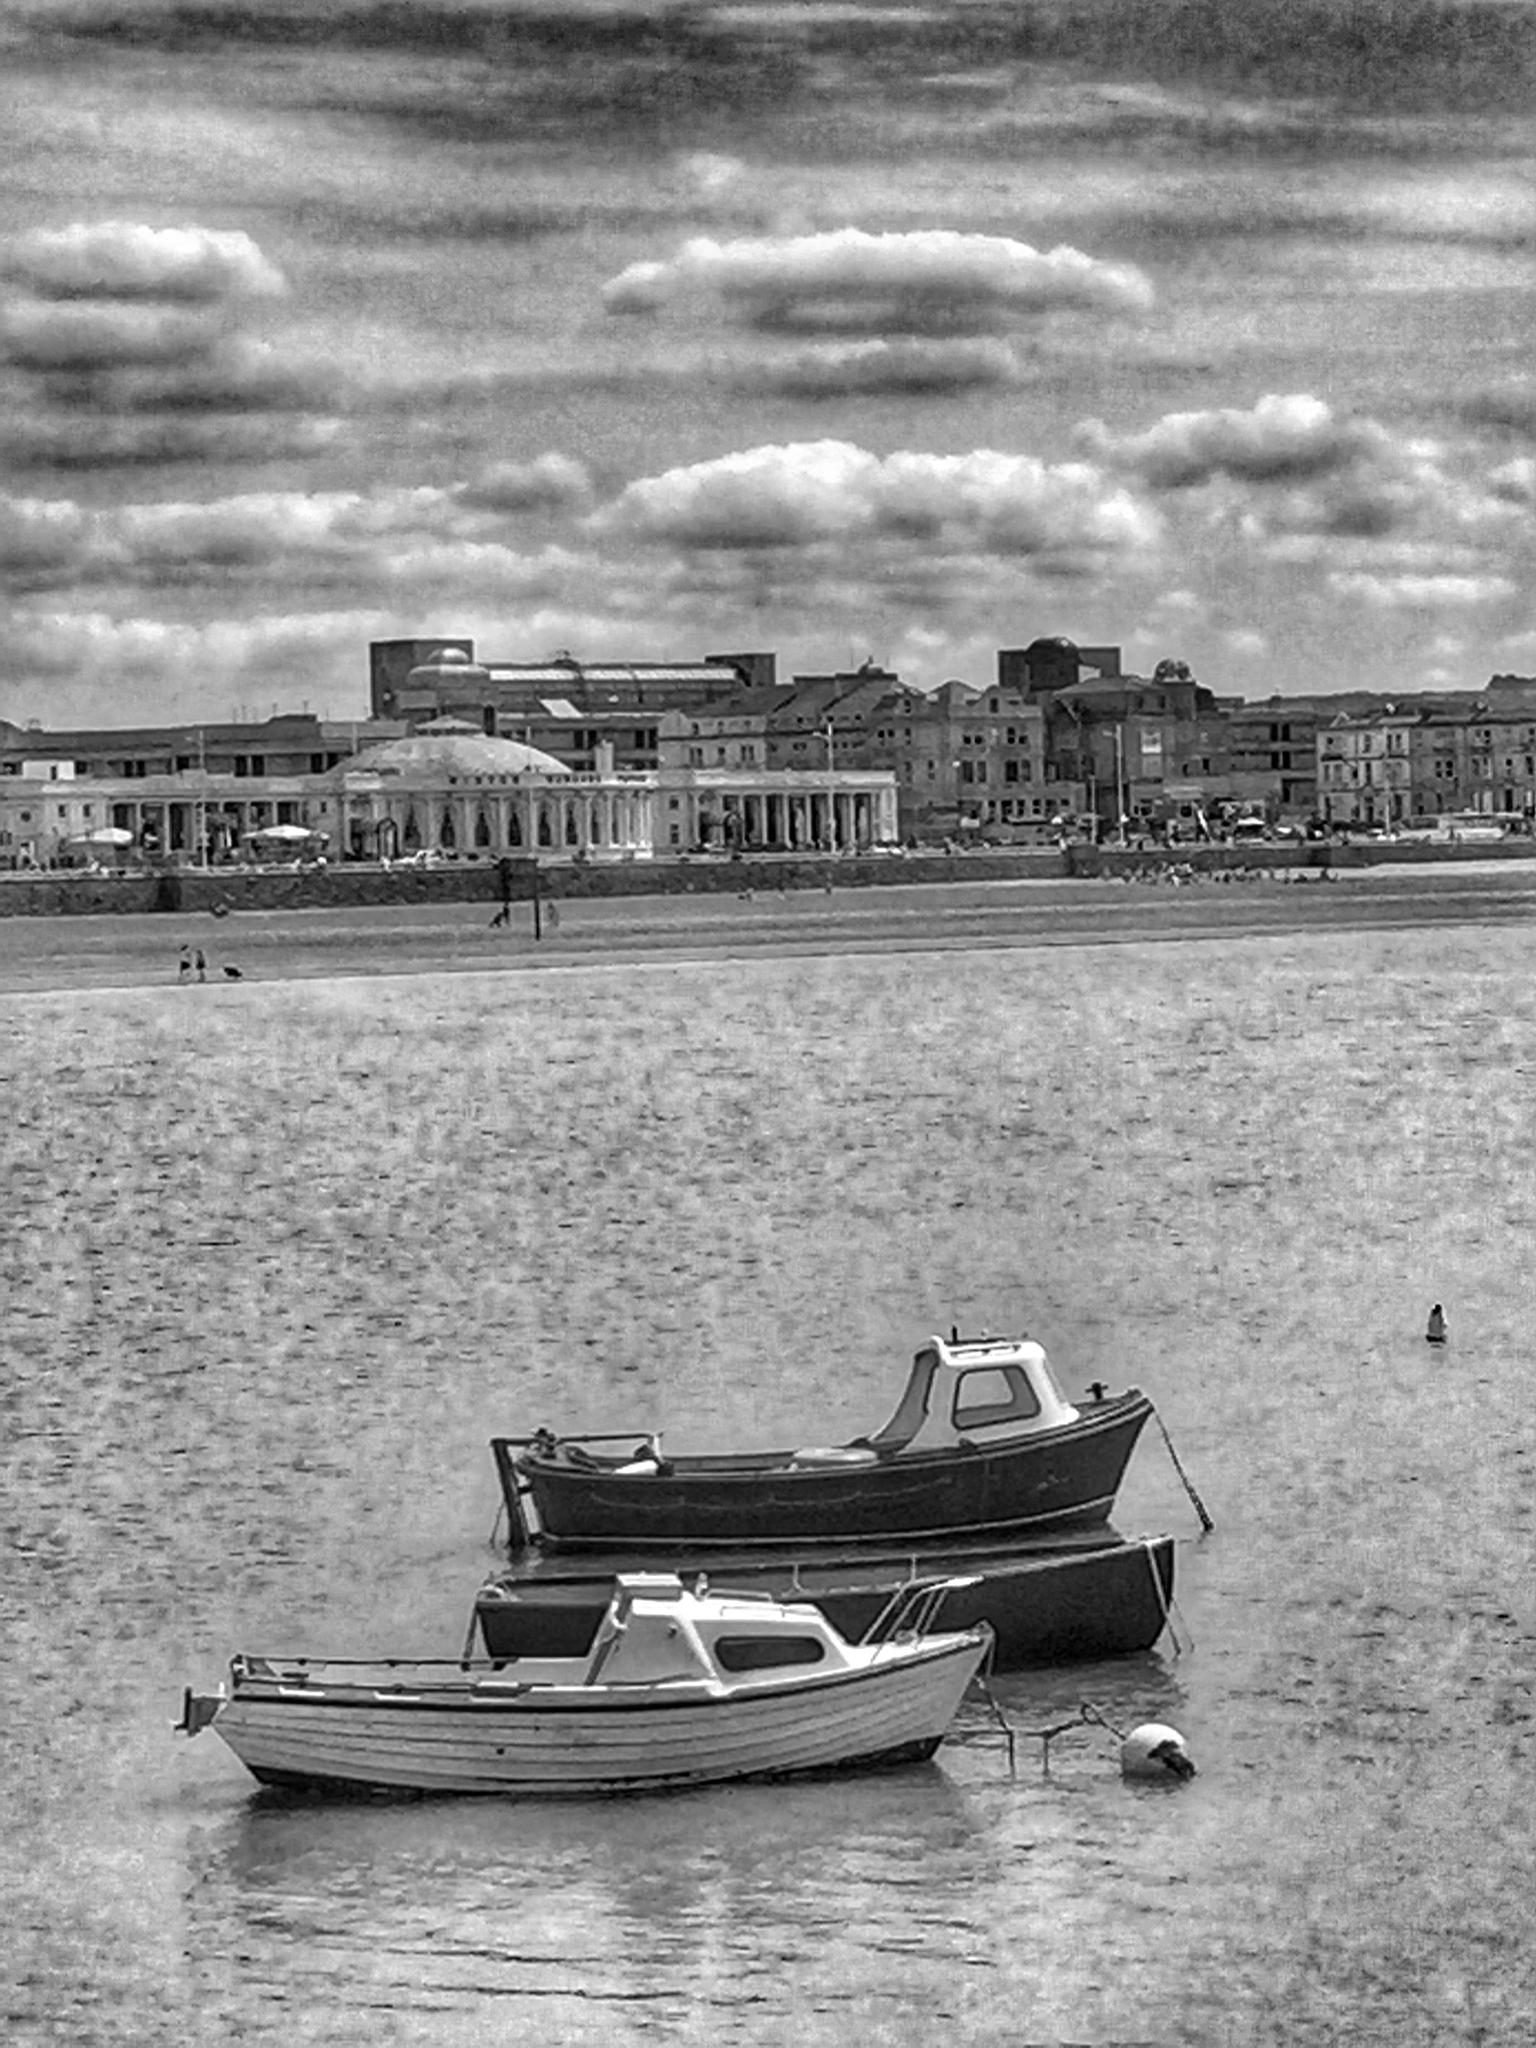 Row row row your boat  by debi.Moss.3